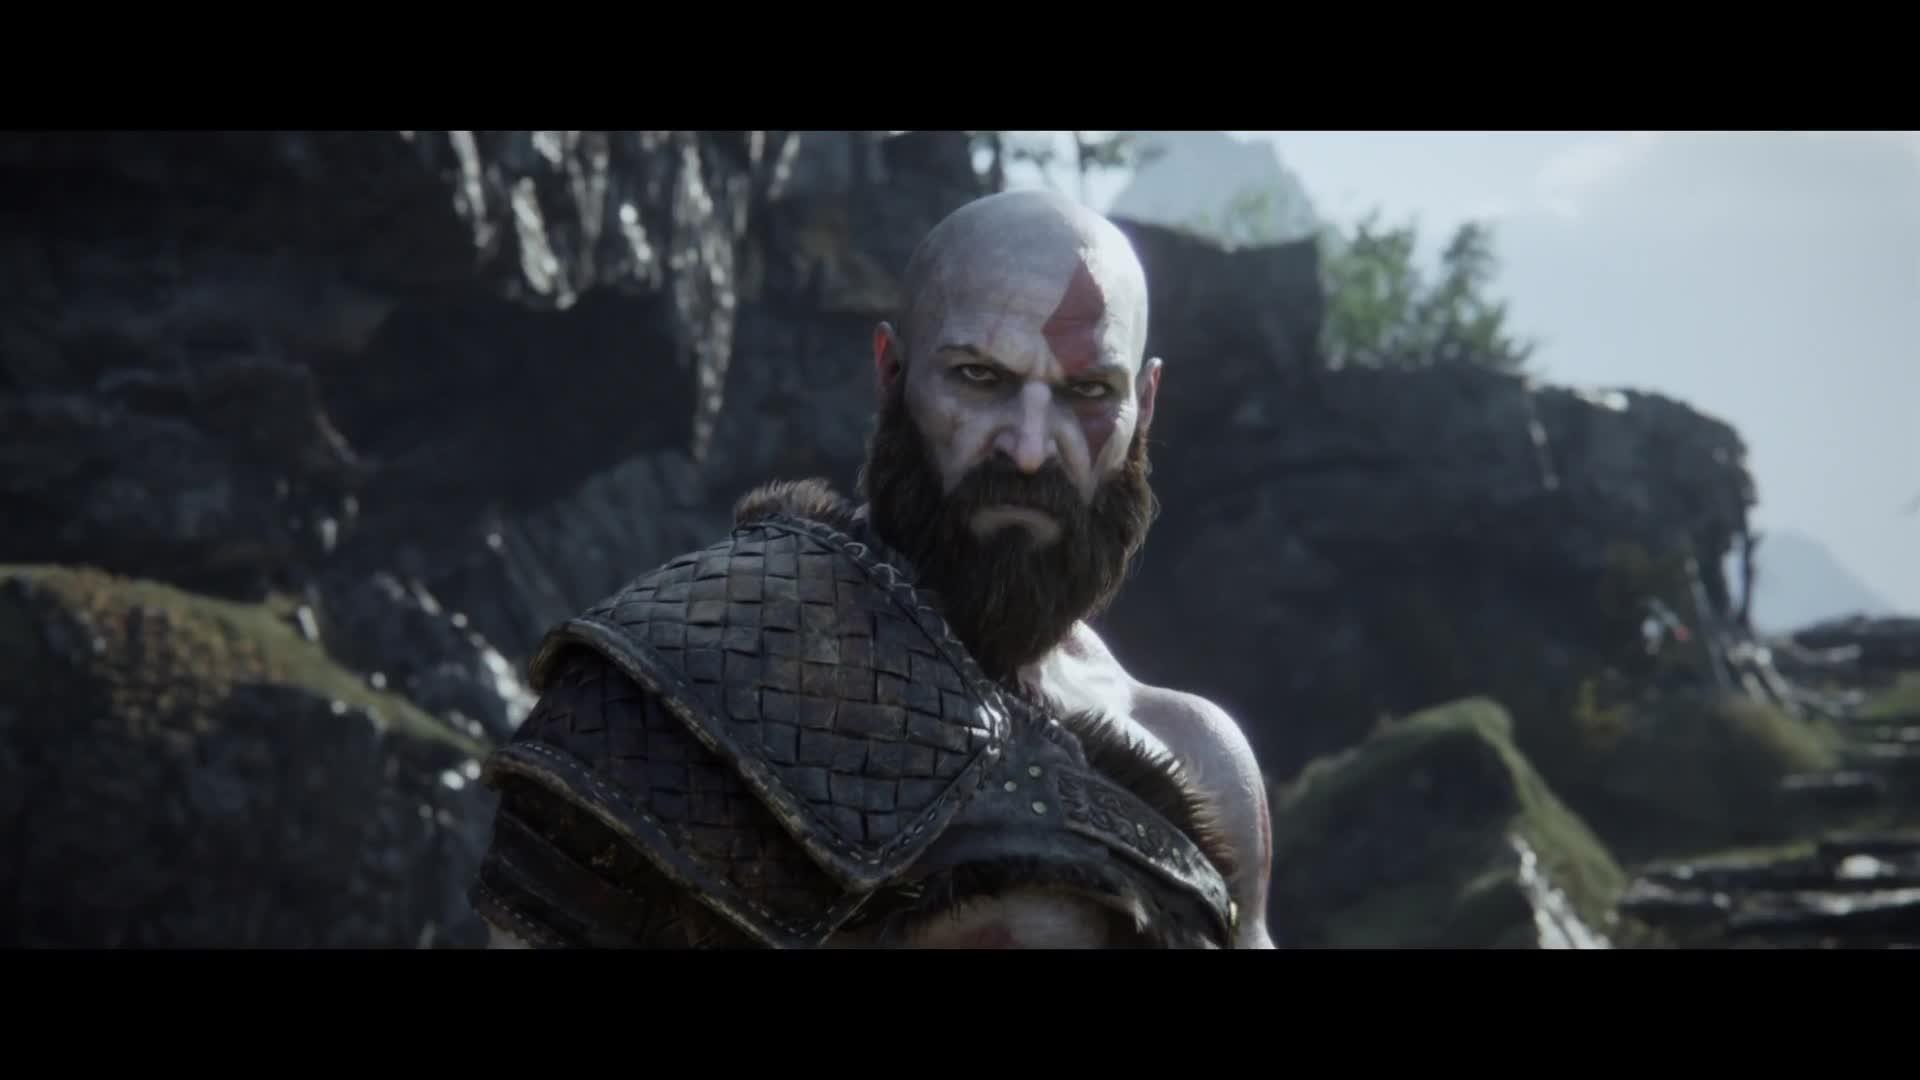 Atreus, Cory Barlog, E3, E3 2017, Gameplay, God of War, Incredible, Kratos, Mythology, Norse, God of War – Again GIFs